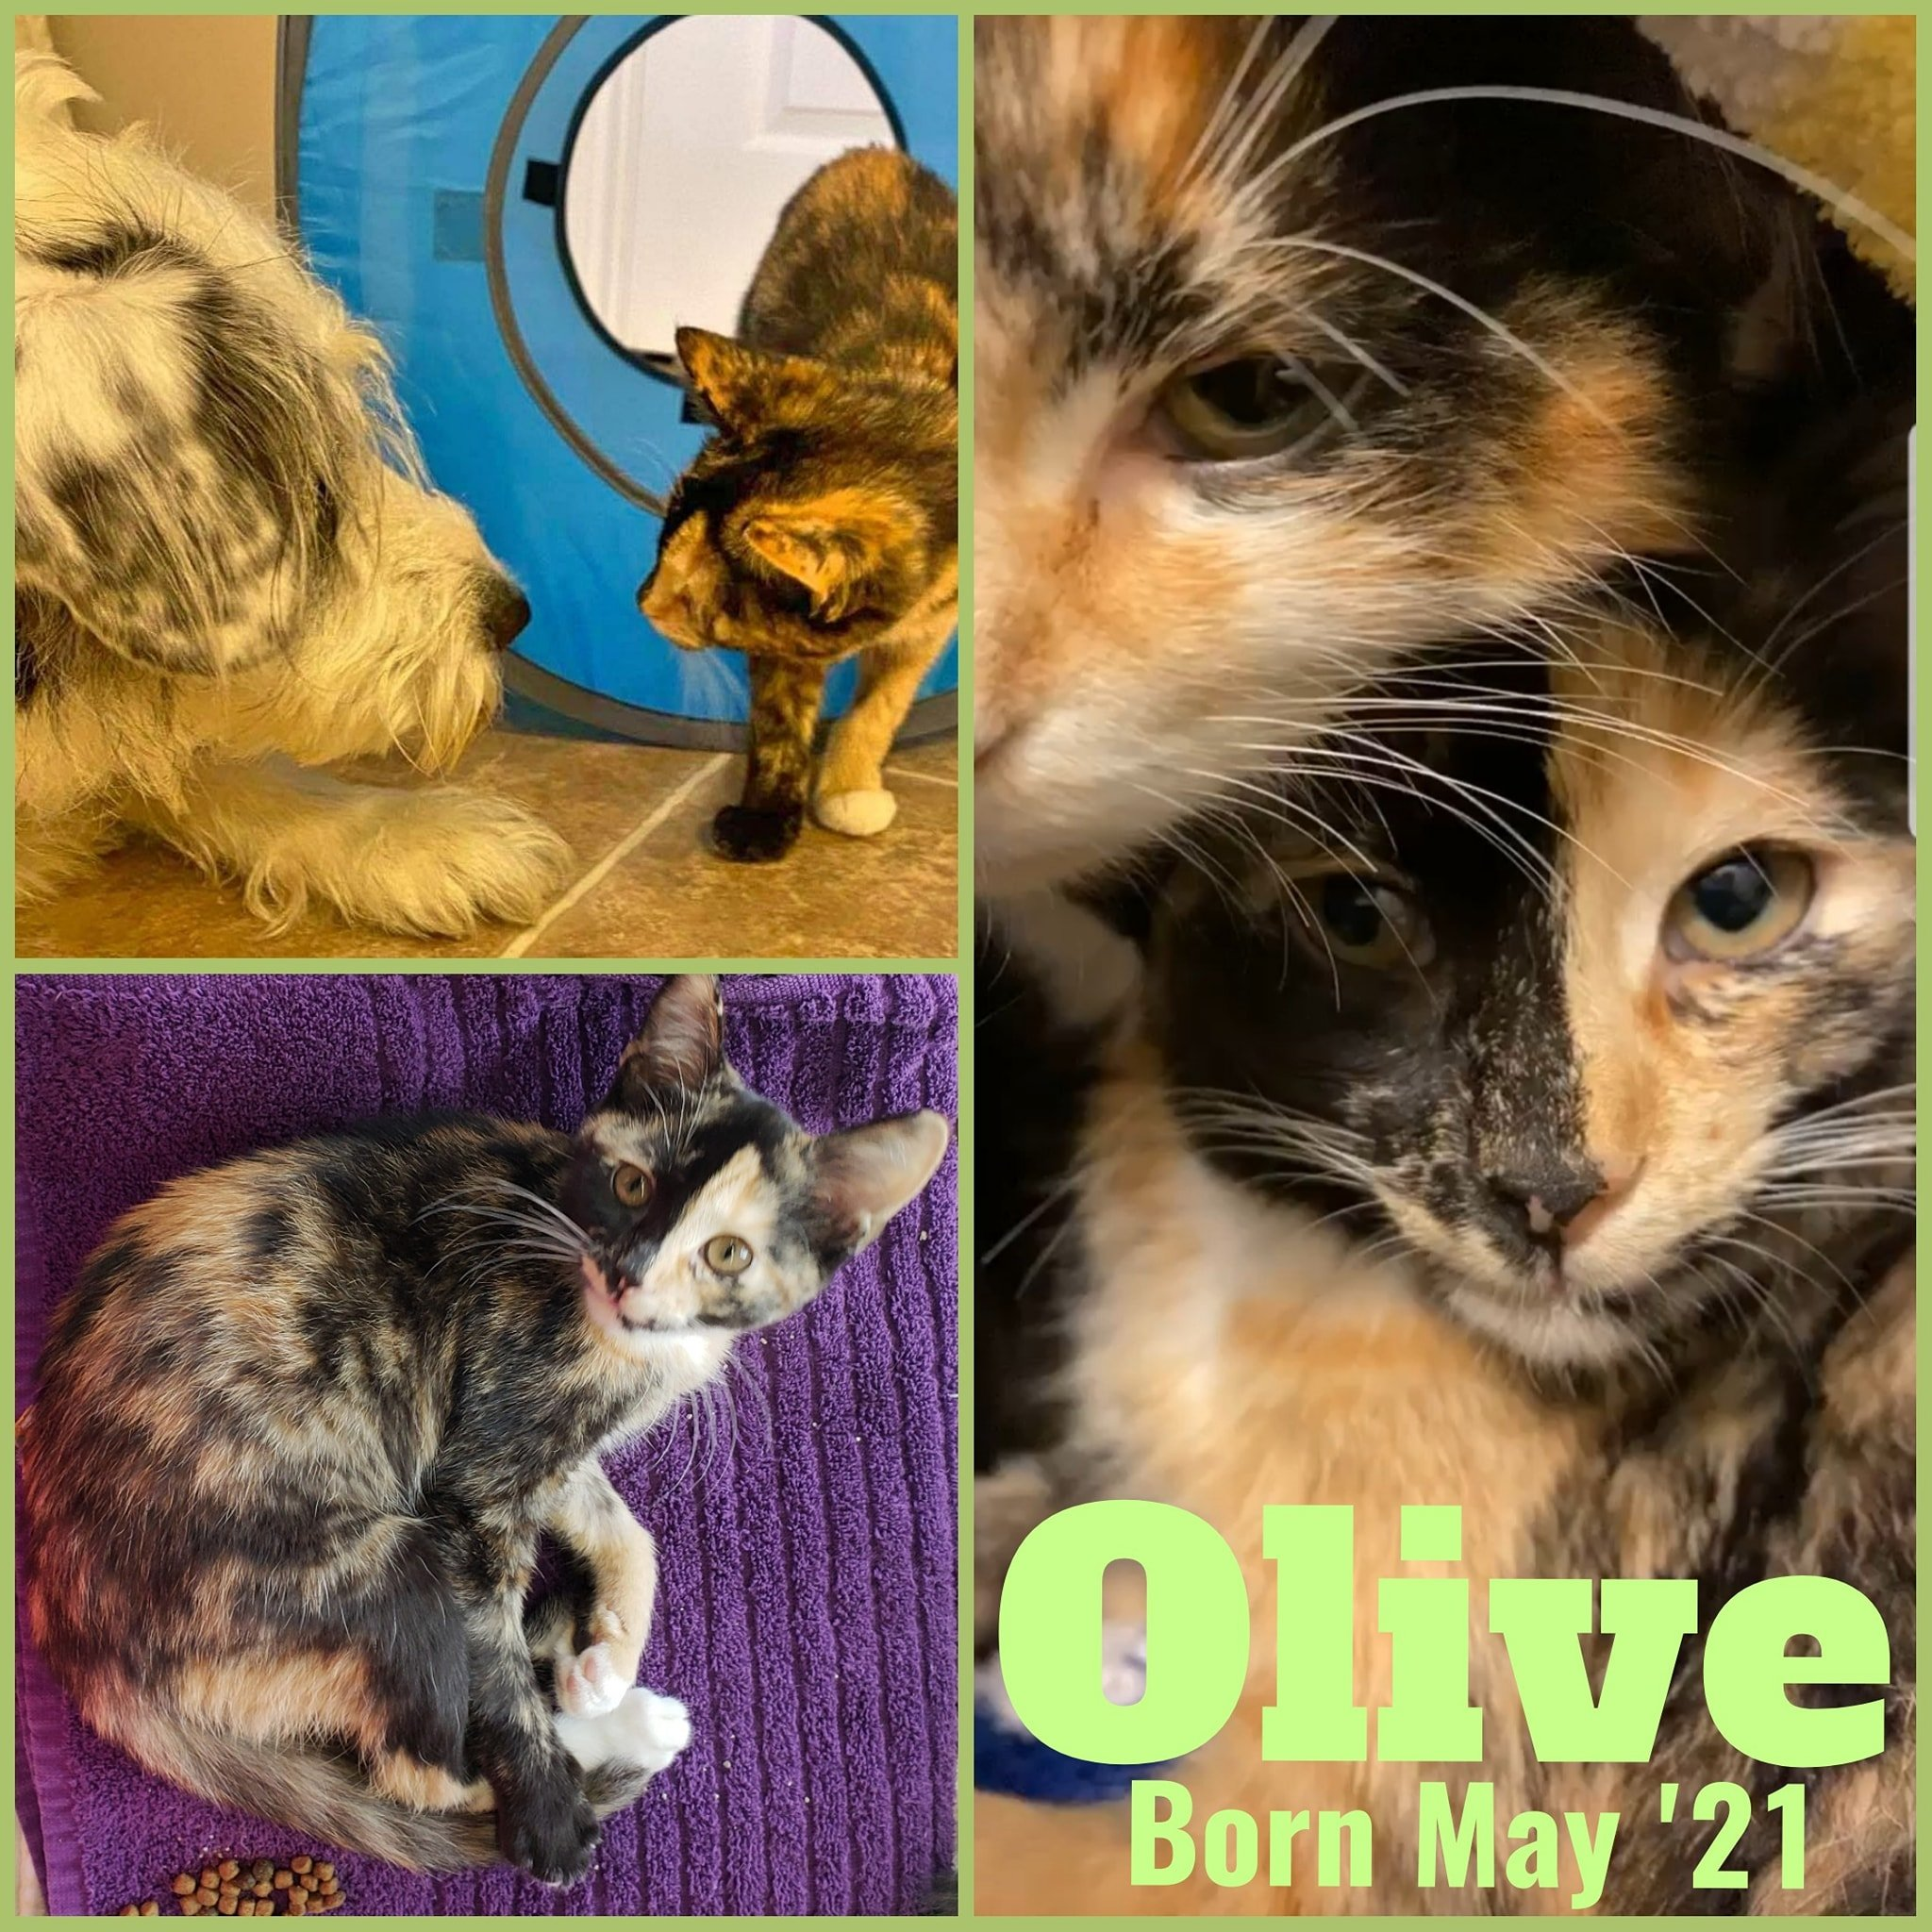 Olive-Female-Born May 21-ADOPTION PENDING